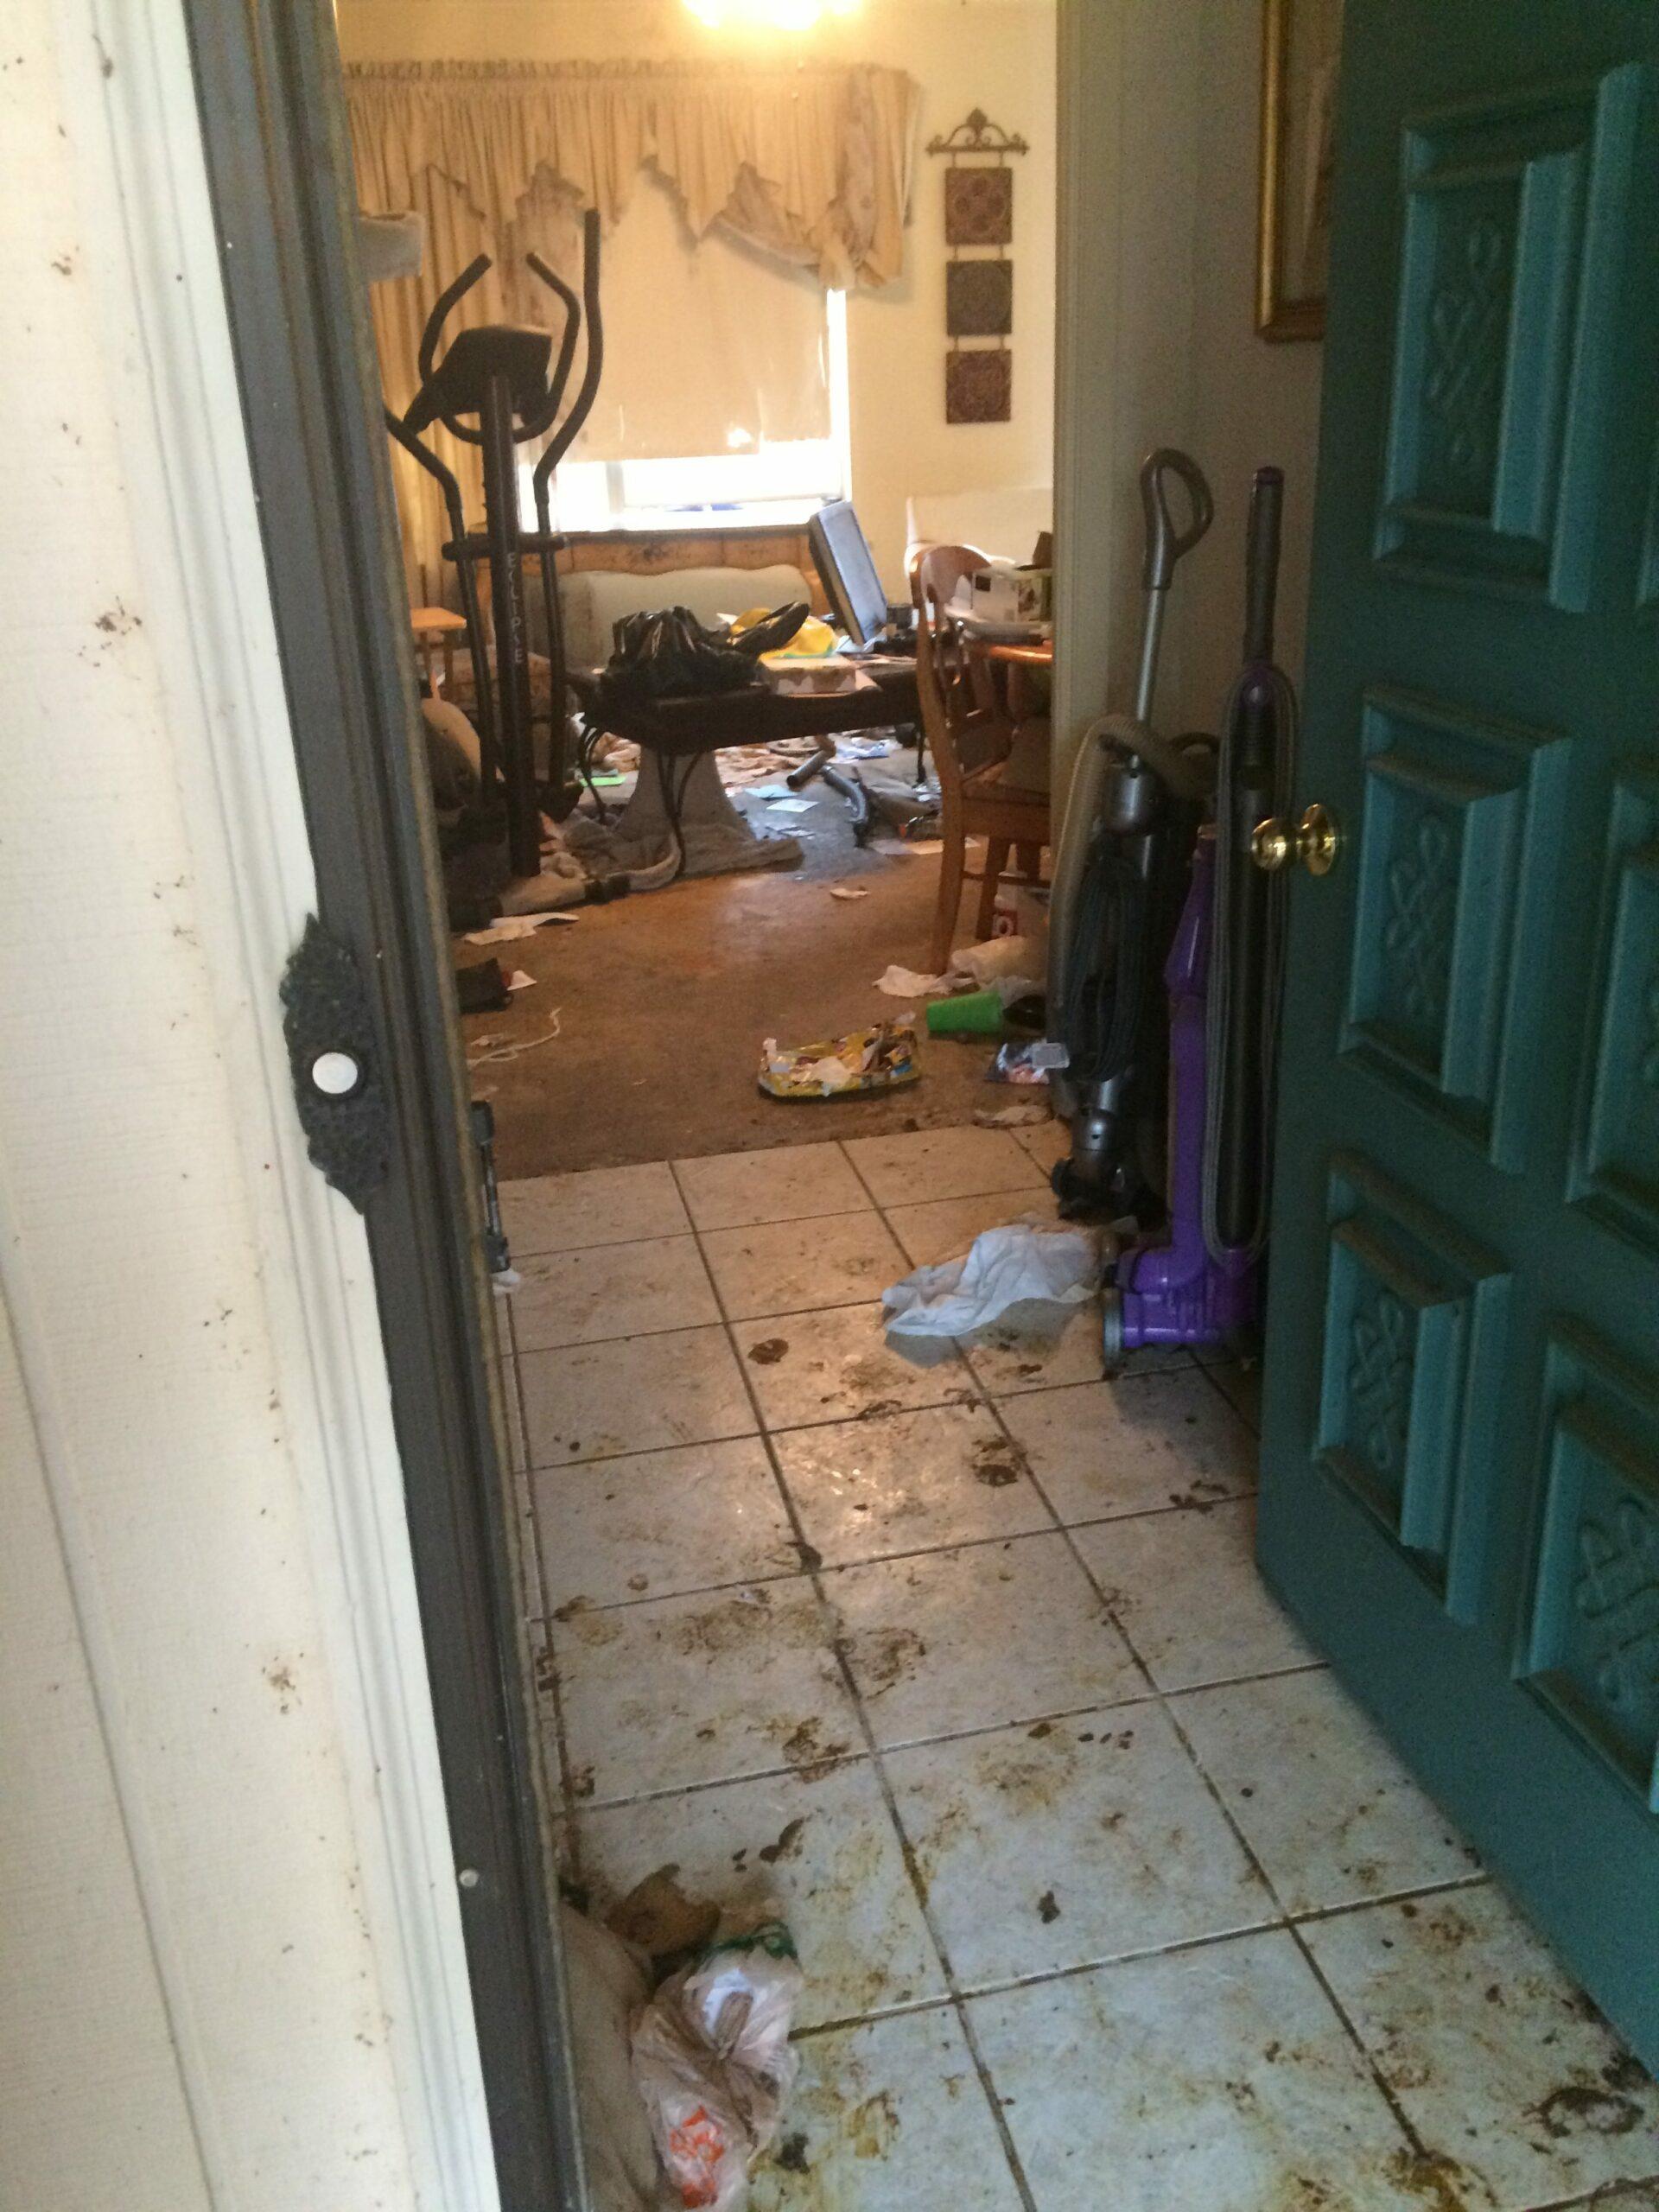 Arlington cat hoarder house entry before